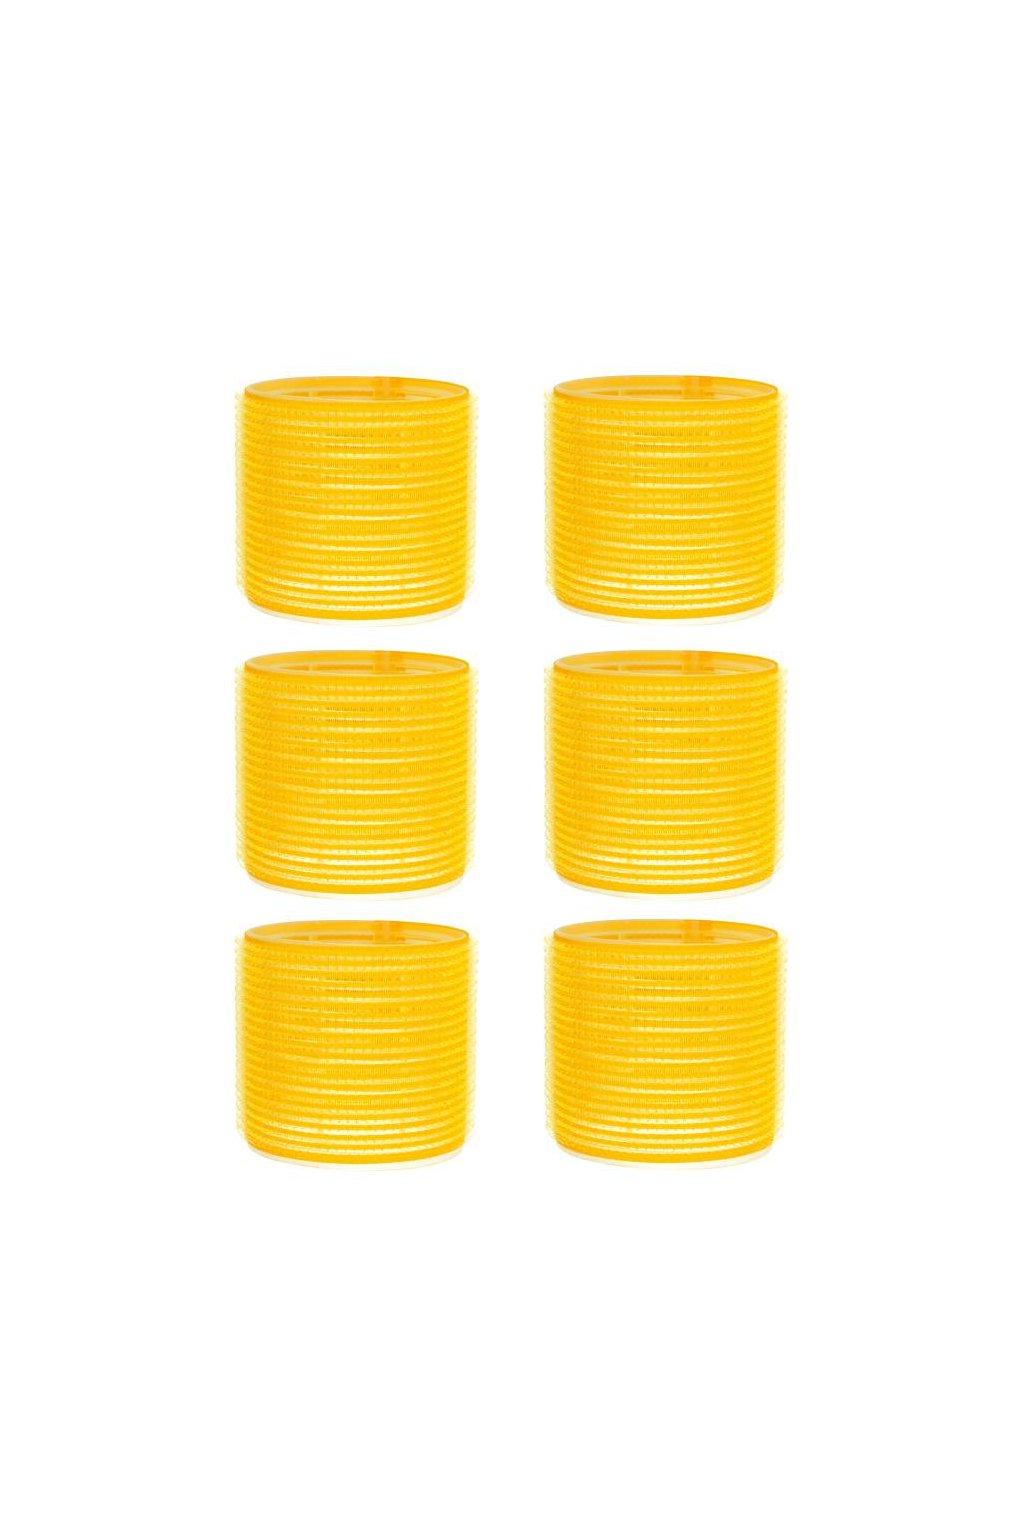 Natáčky suchý zip průměr 66mm žluté Xanitalia